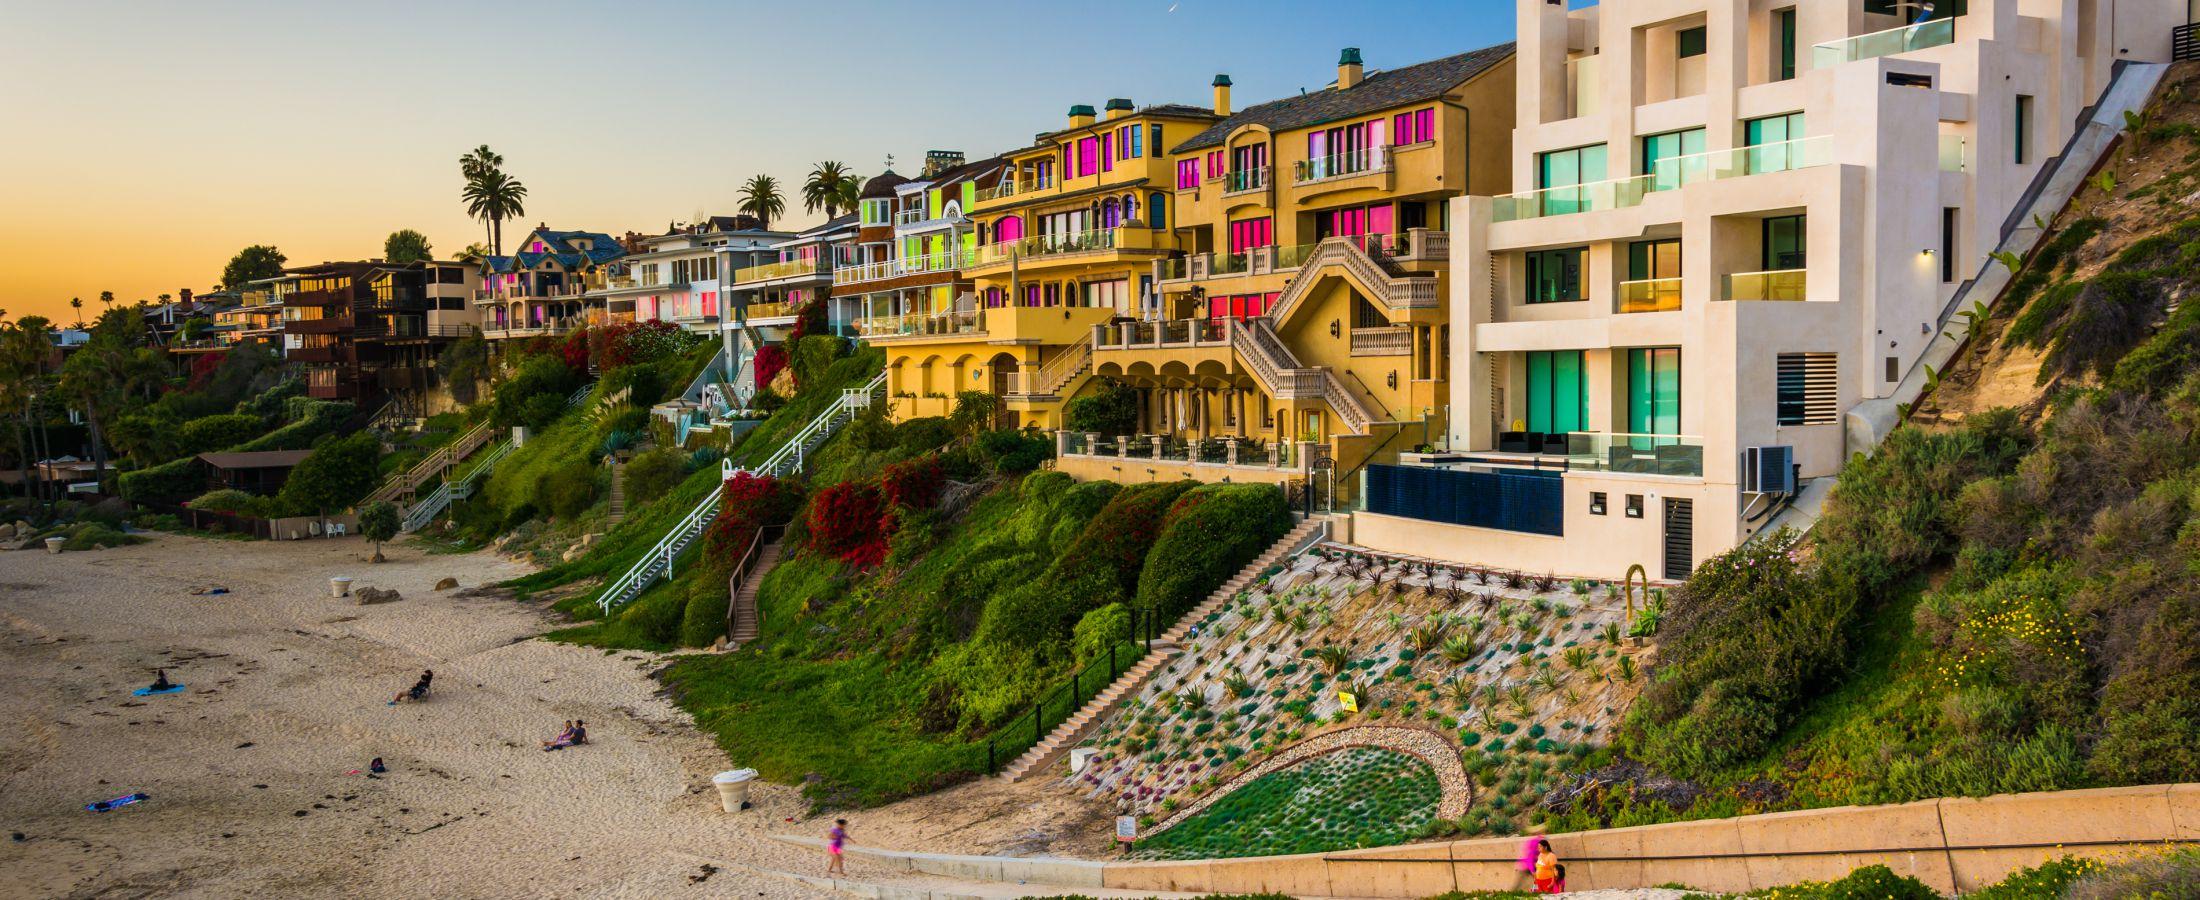 Corona Del Mar Real Estate | Corona Del Mar Homes and Condos for Sale